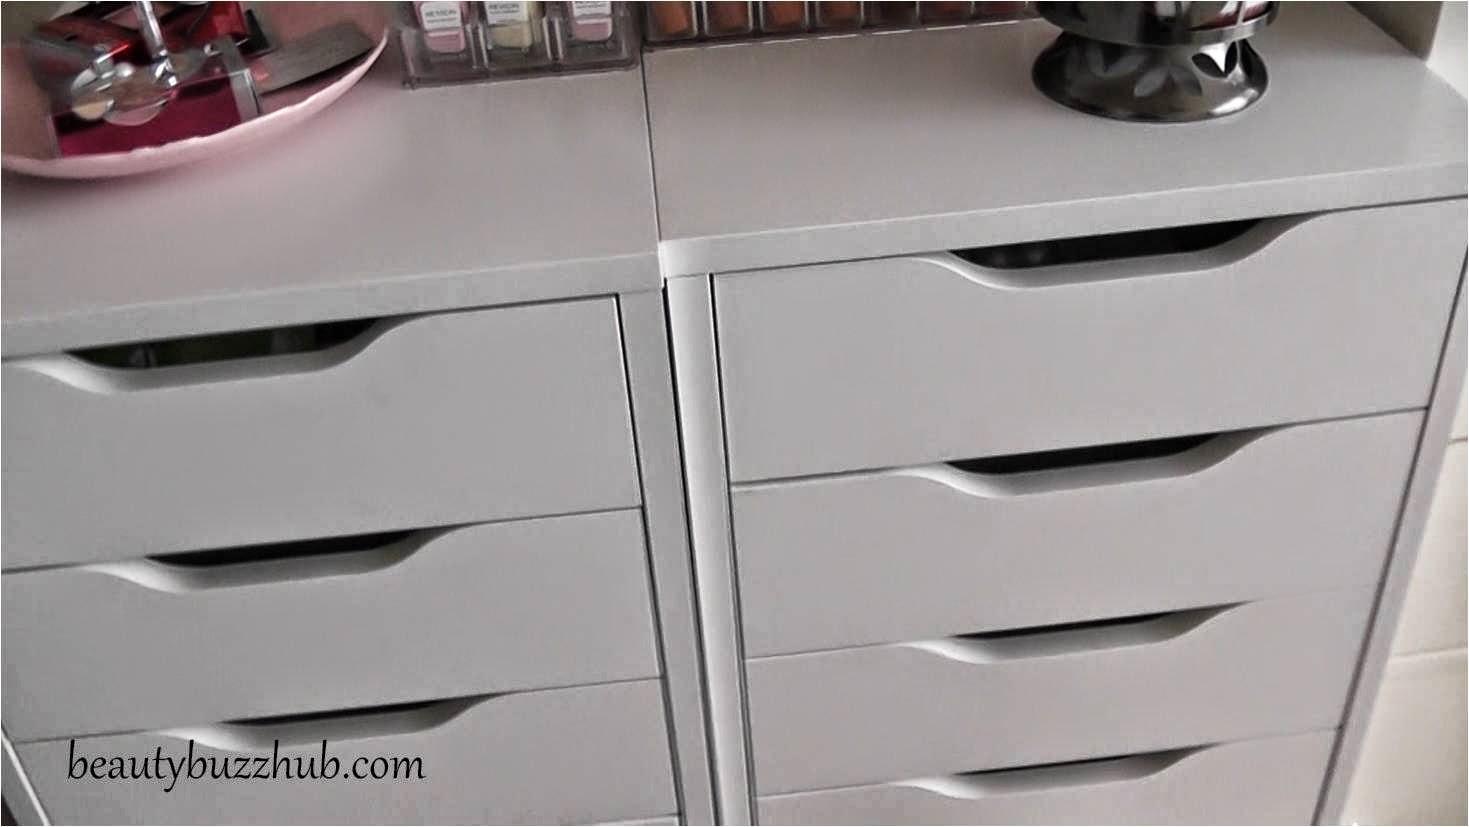 ikea alex makeup storage organization. Black Bedroom Furniture Sets. Home Design Ideas